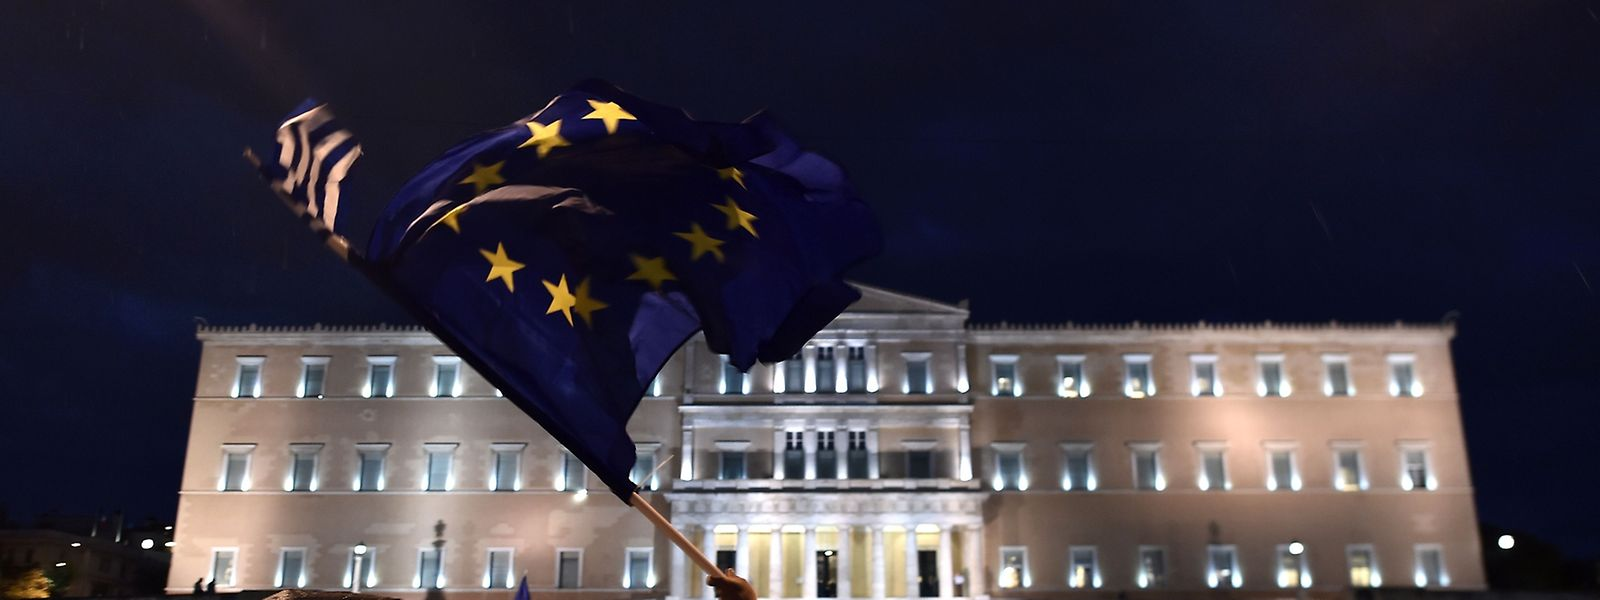 Manifestation pro-européenne en Grèce, mardi soir.